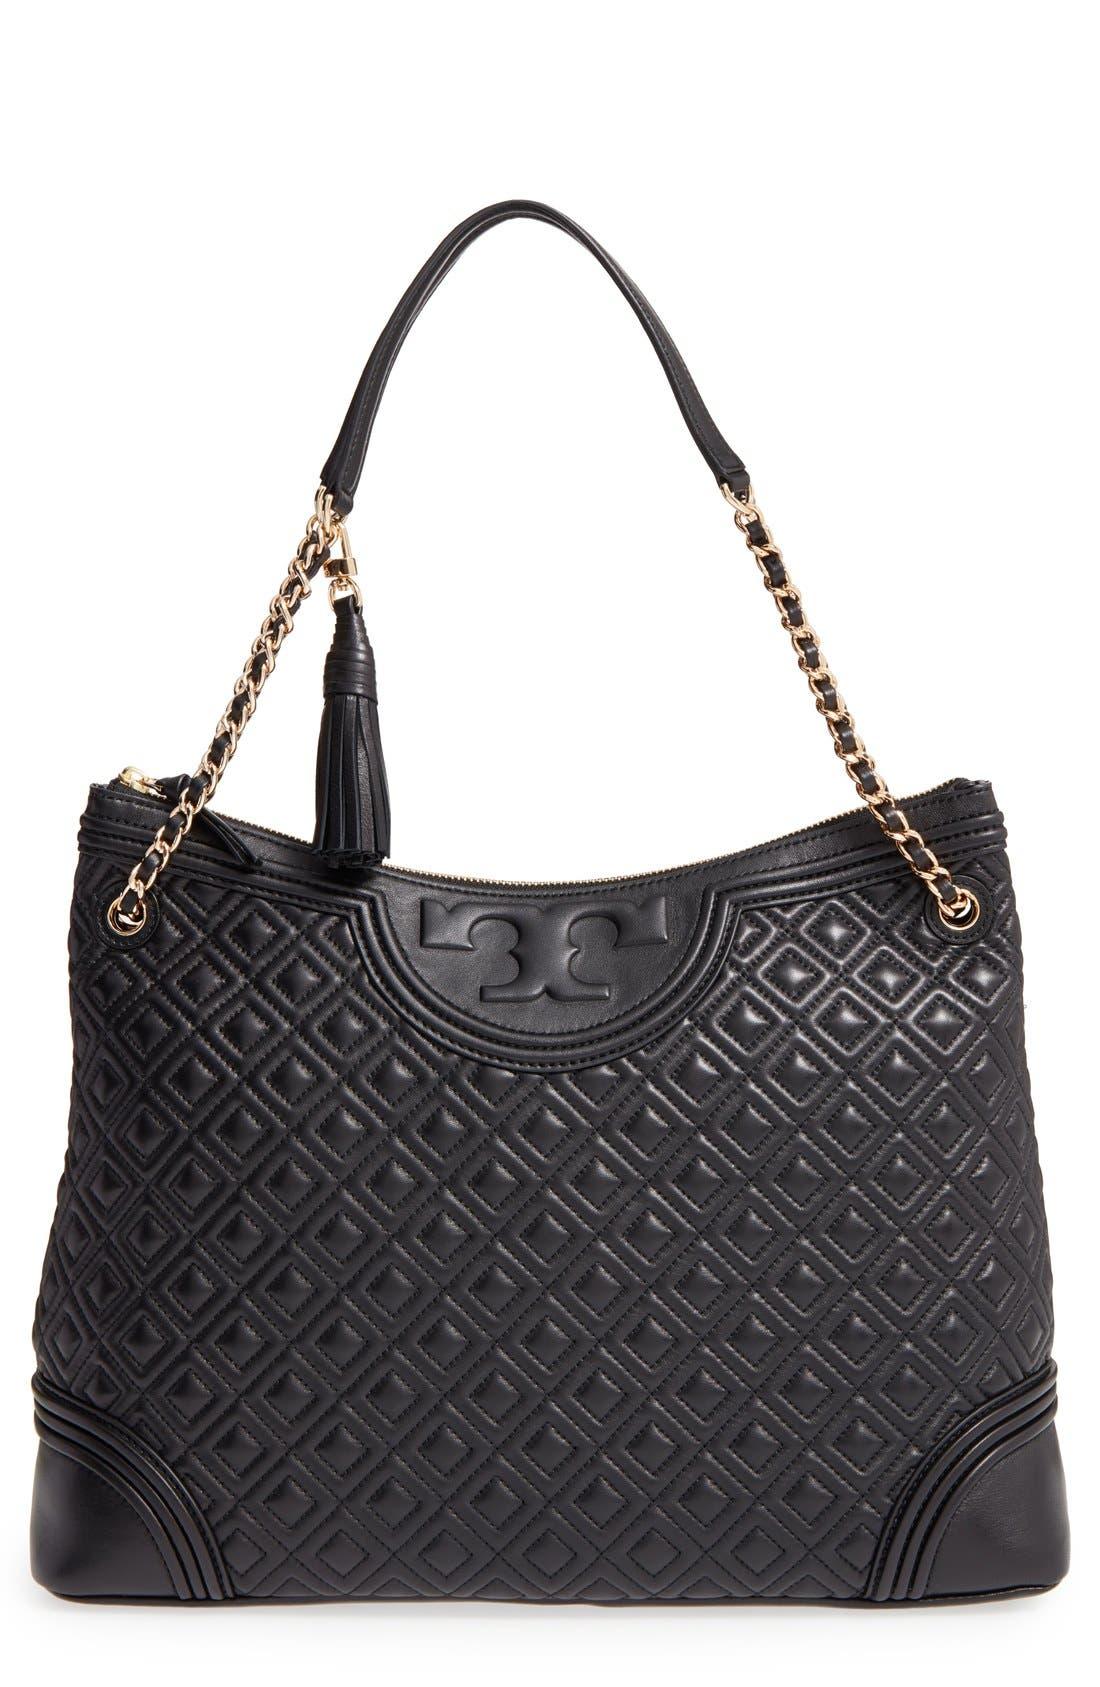 Alternate Image 1 Selected - Tory Burch 'Fleming' Leather Shoulder Bag